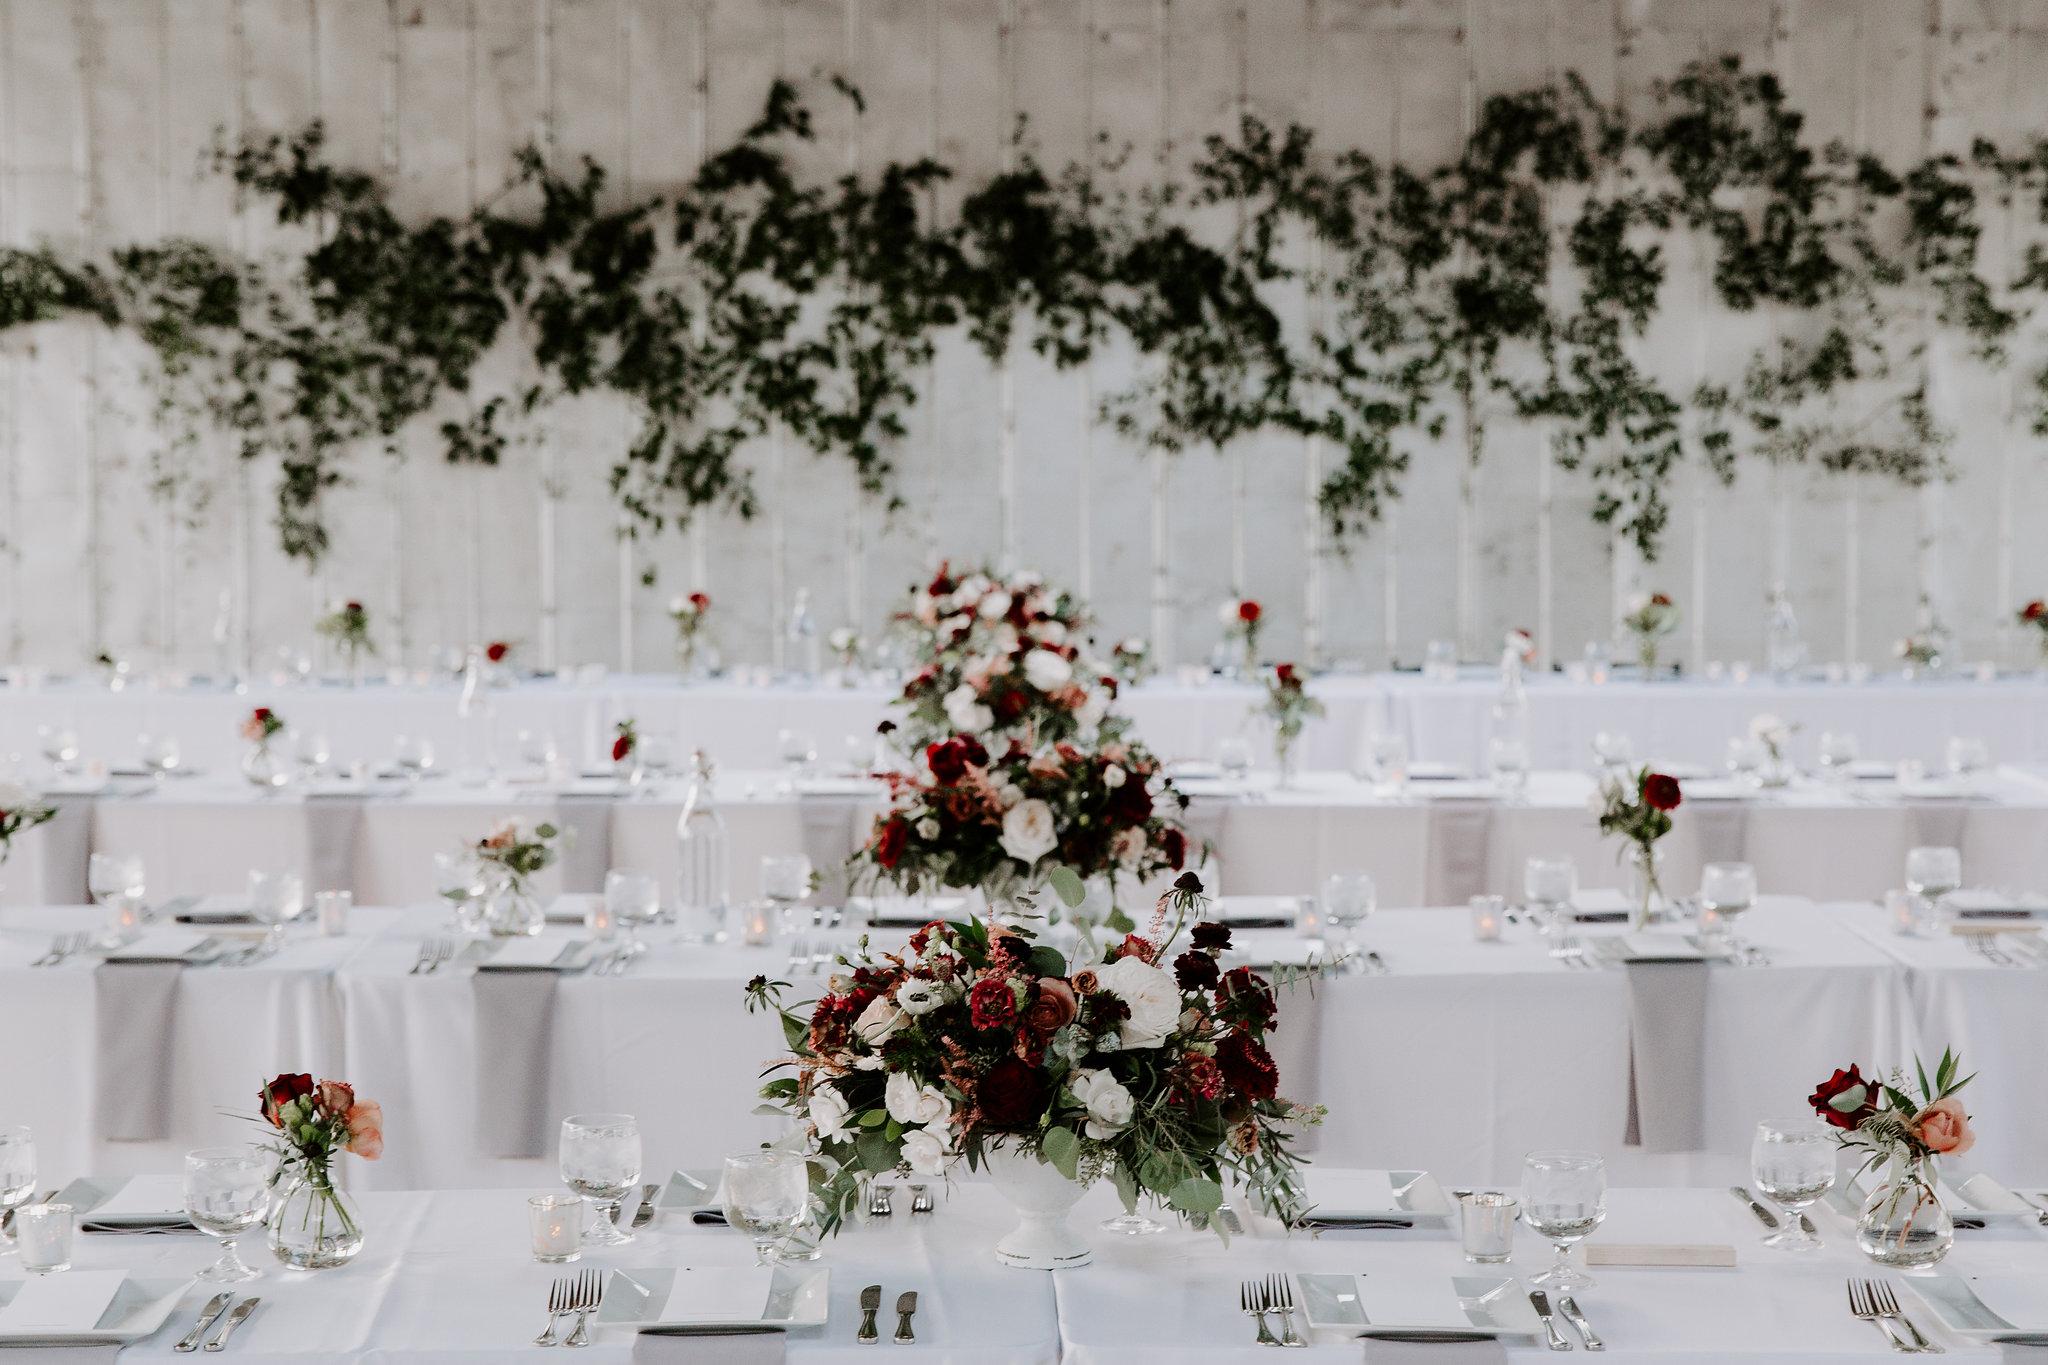 Minimalist Industrial Wedding A Griffin Events Mikayla Herrick DC585.jpg